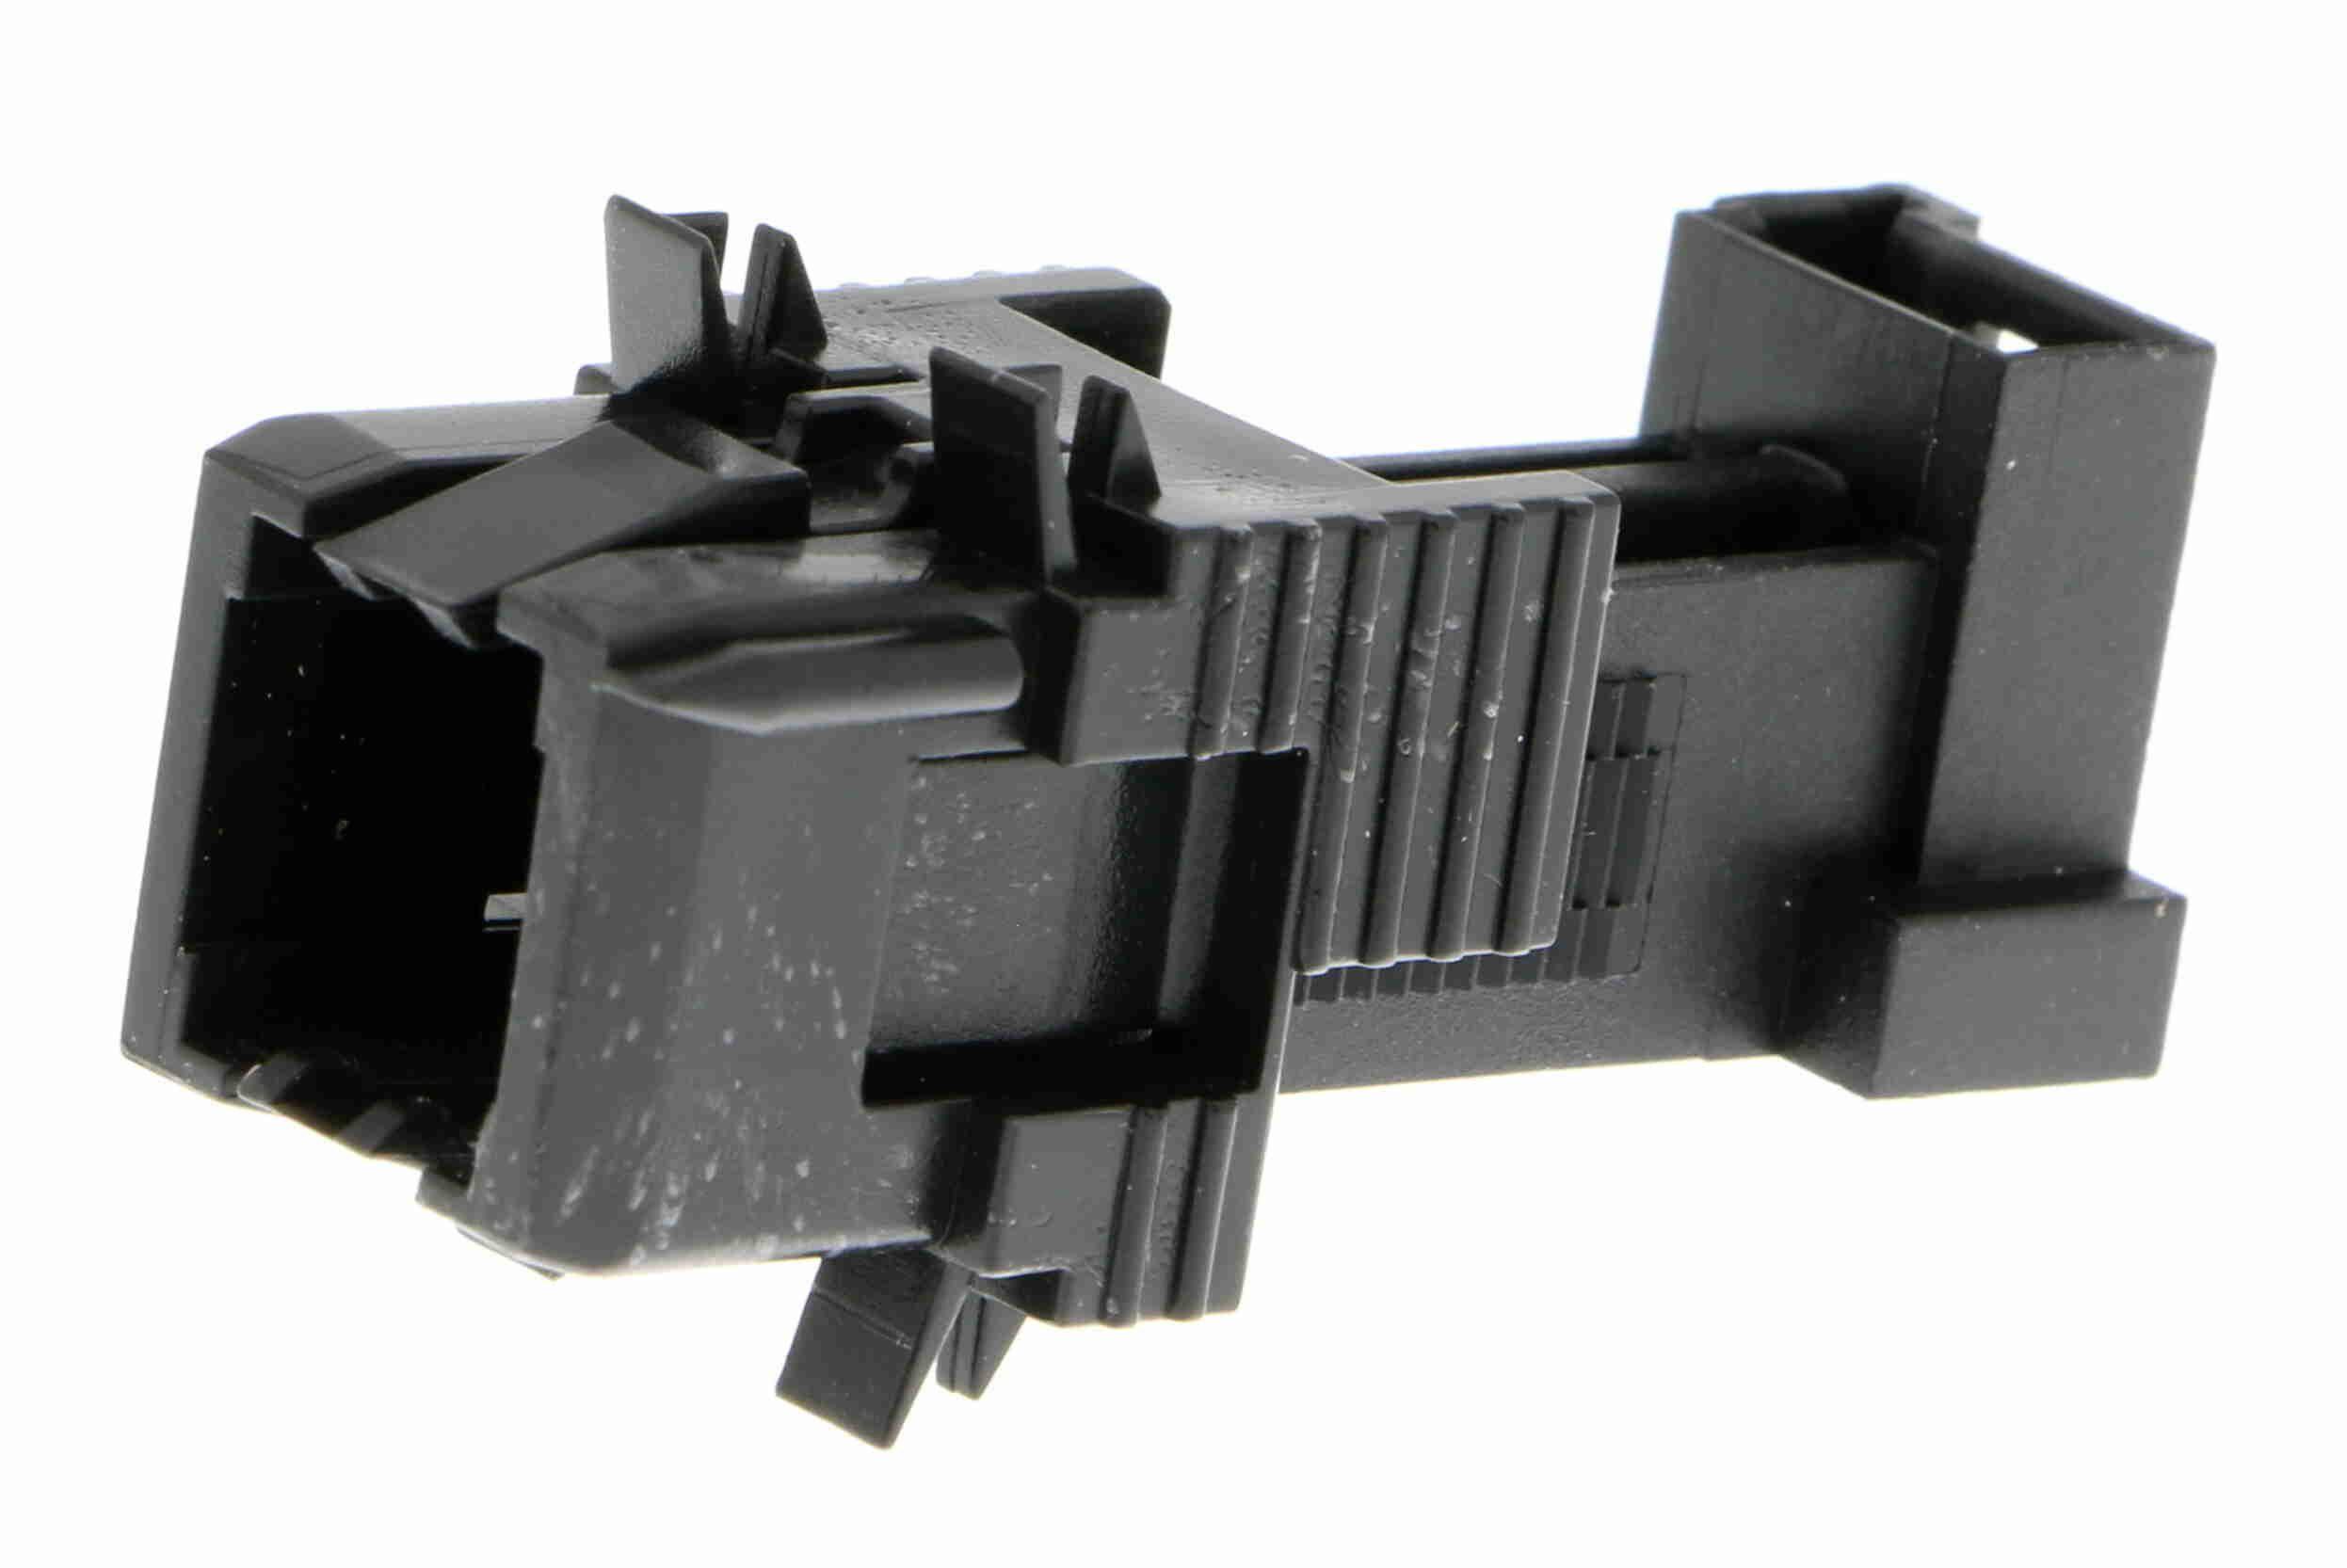 VEMO Bremslichtschalter V20-73-0127